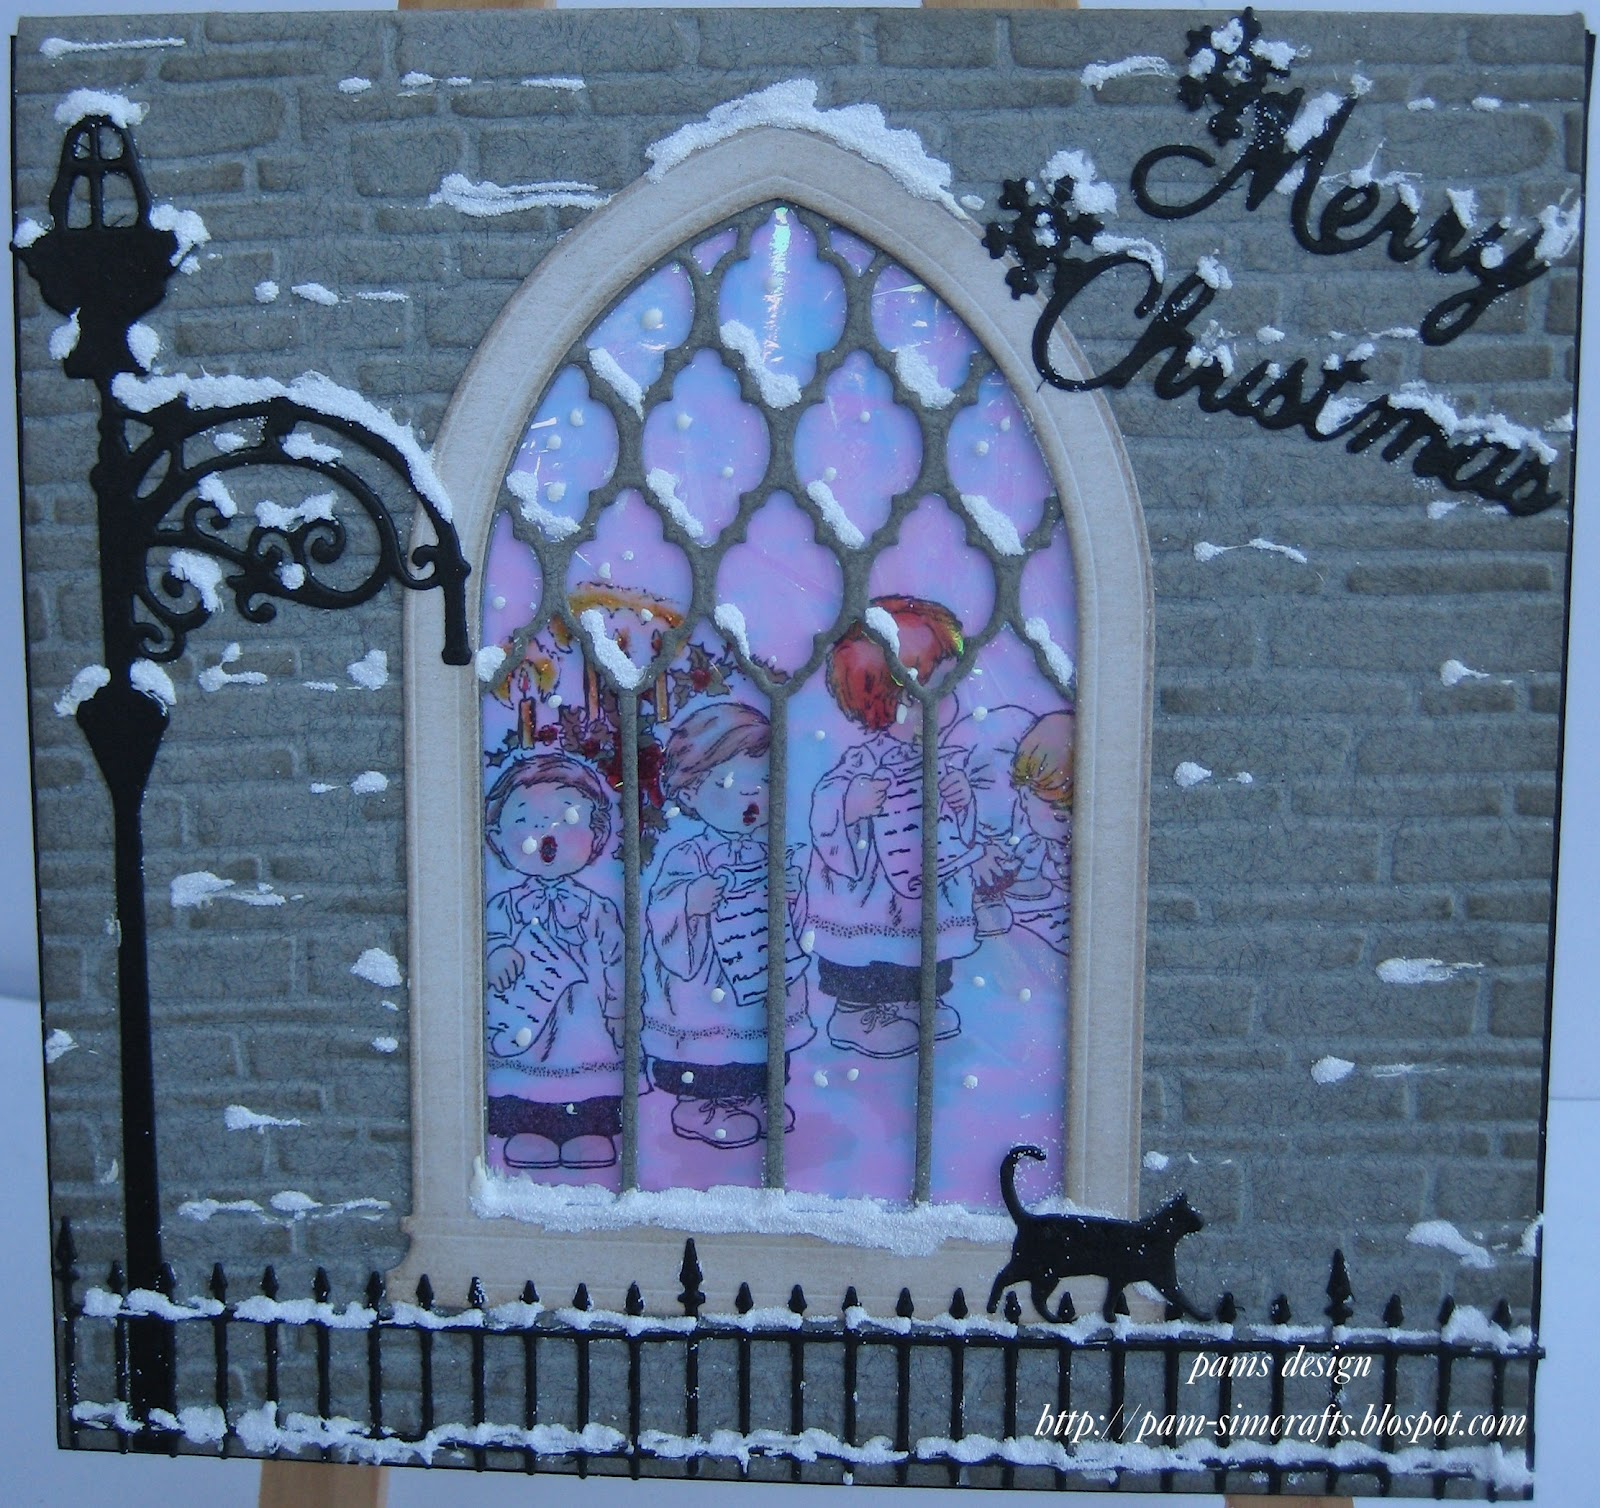 pamscrafts gothic window. Black Bedroom Furniture Sets. Home Design Ideas